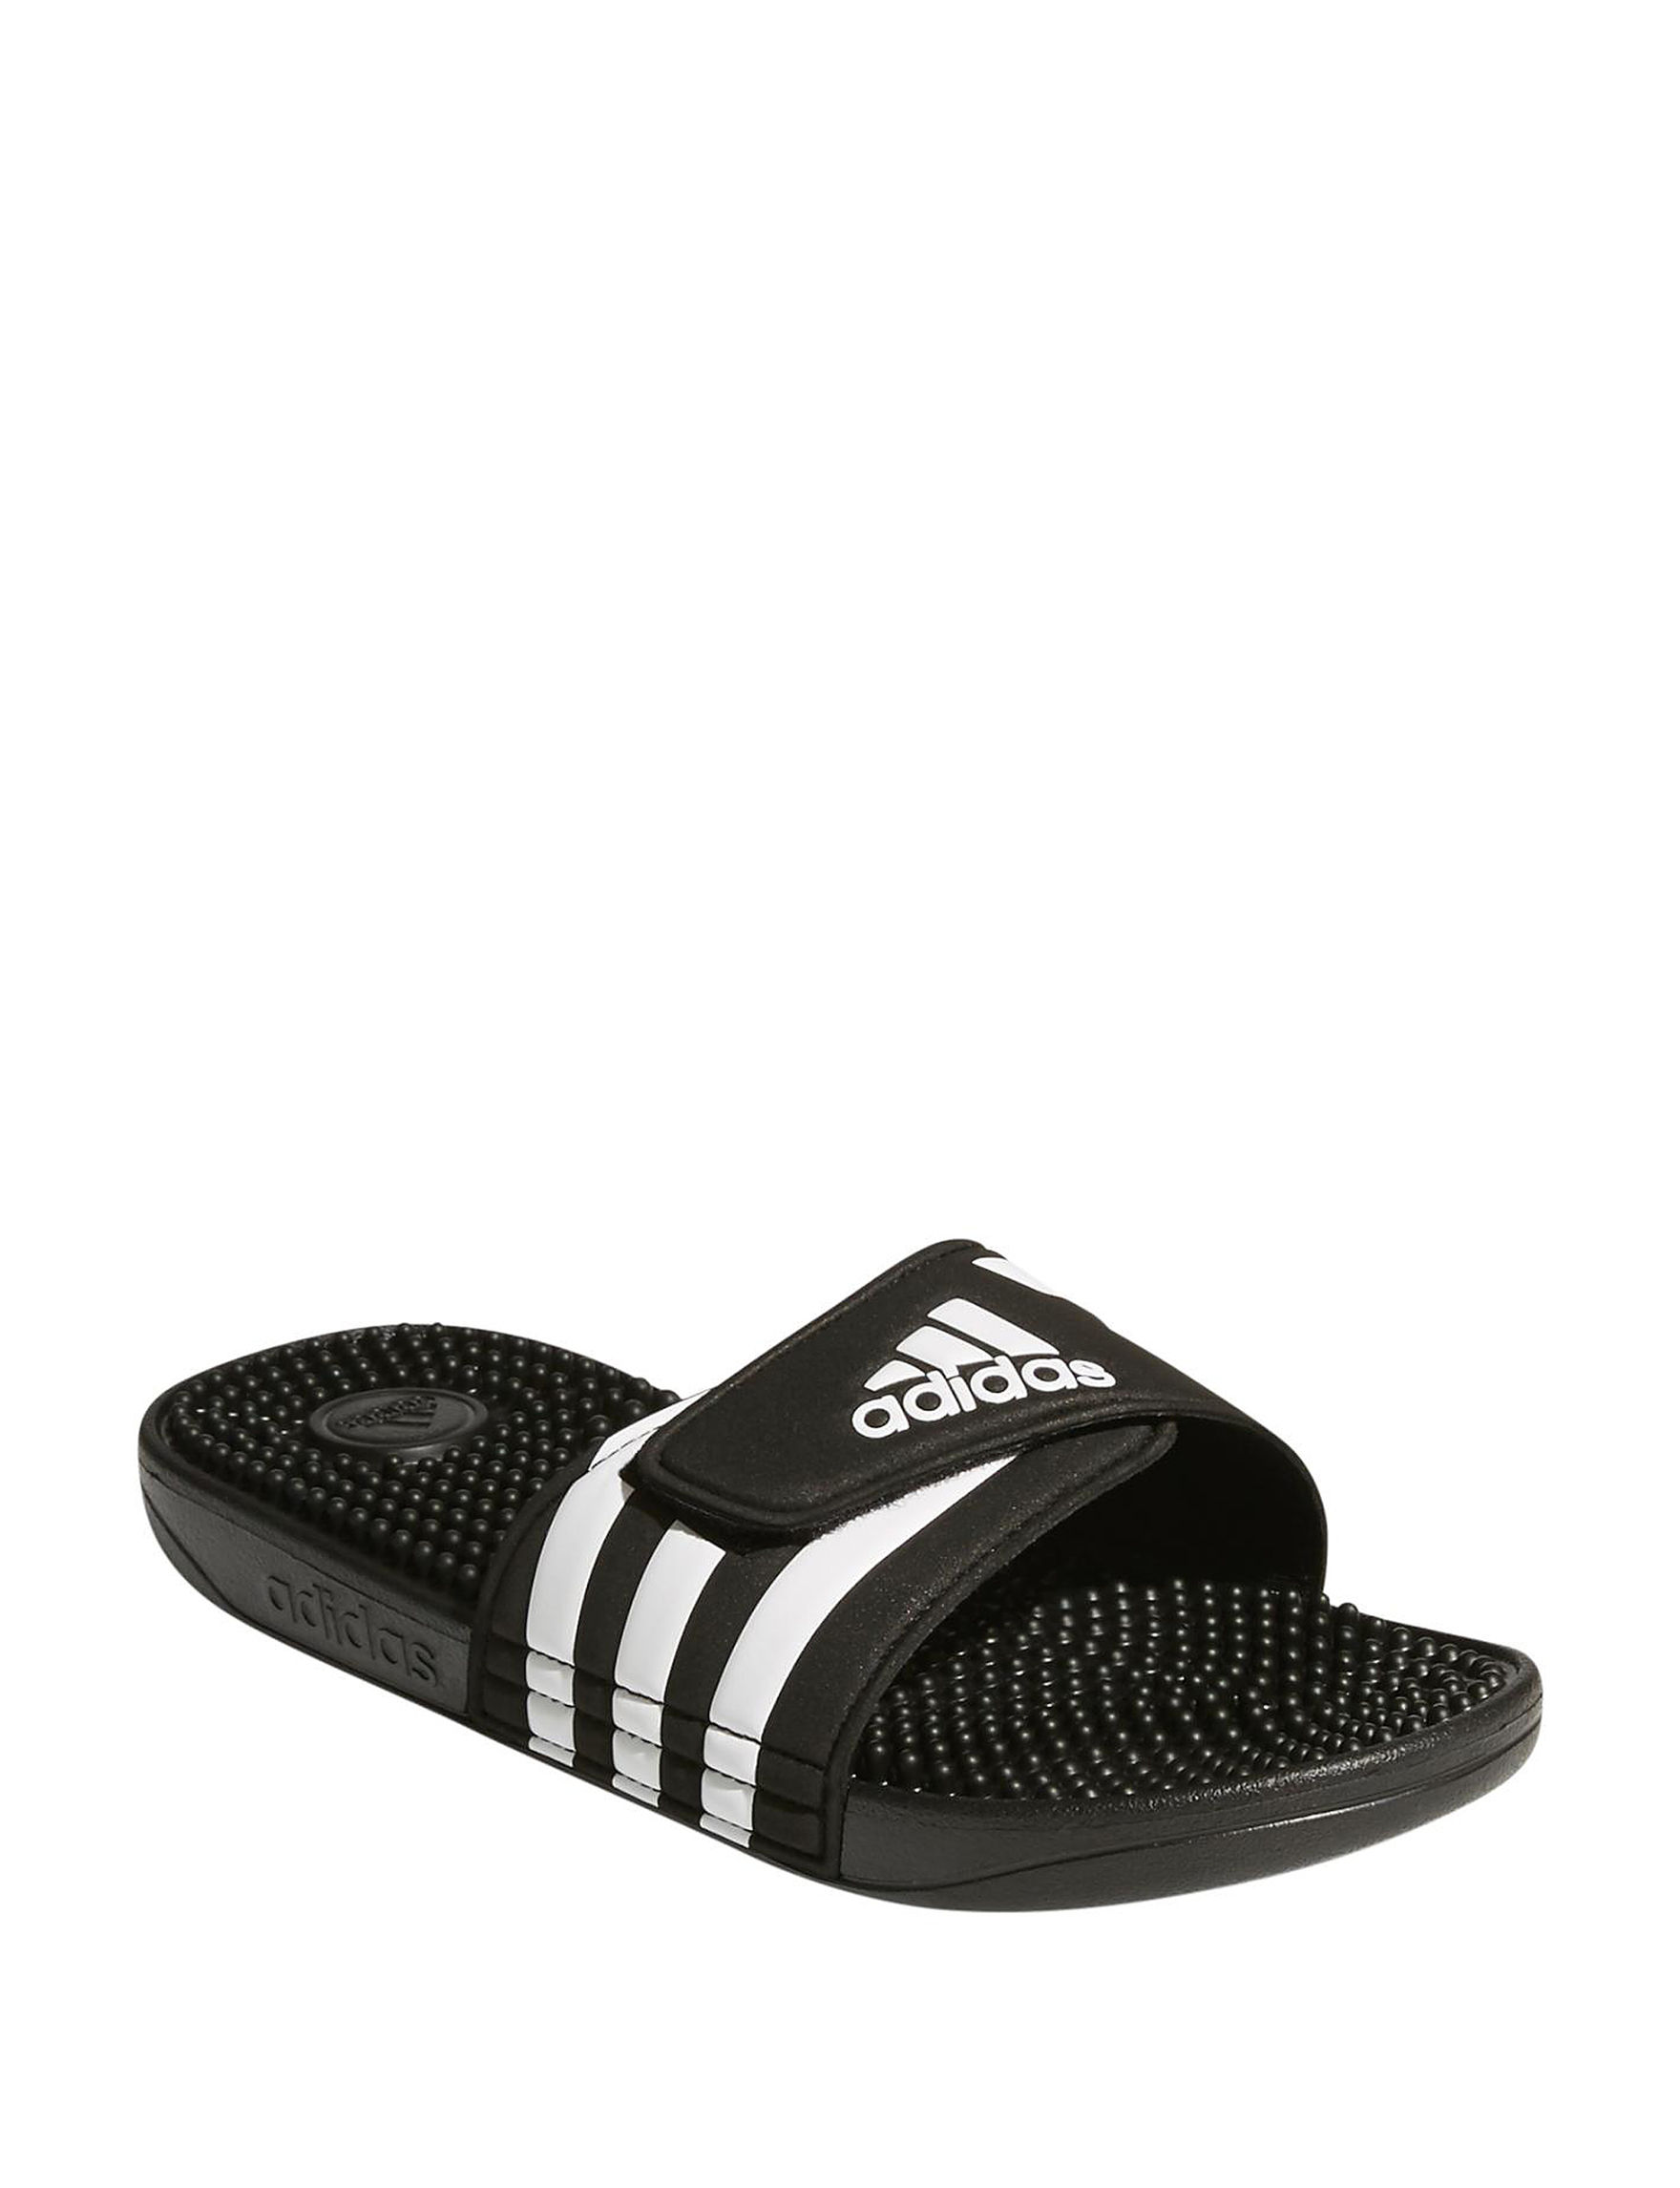 1c3c9efd865d adidas Women s Adissage 3-Stripe Slide Sandals